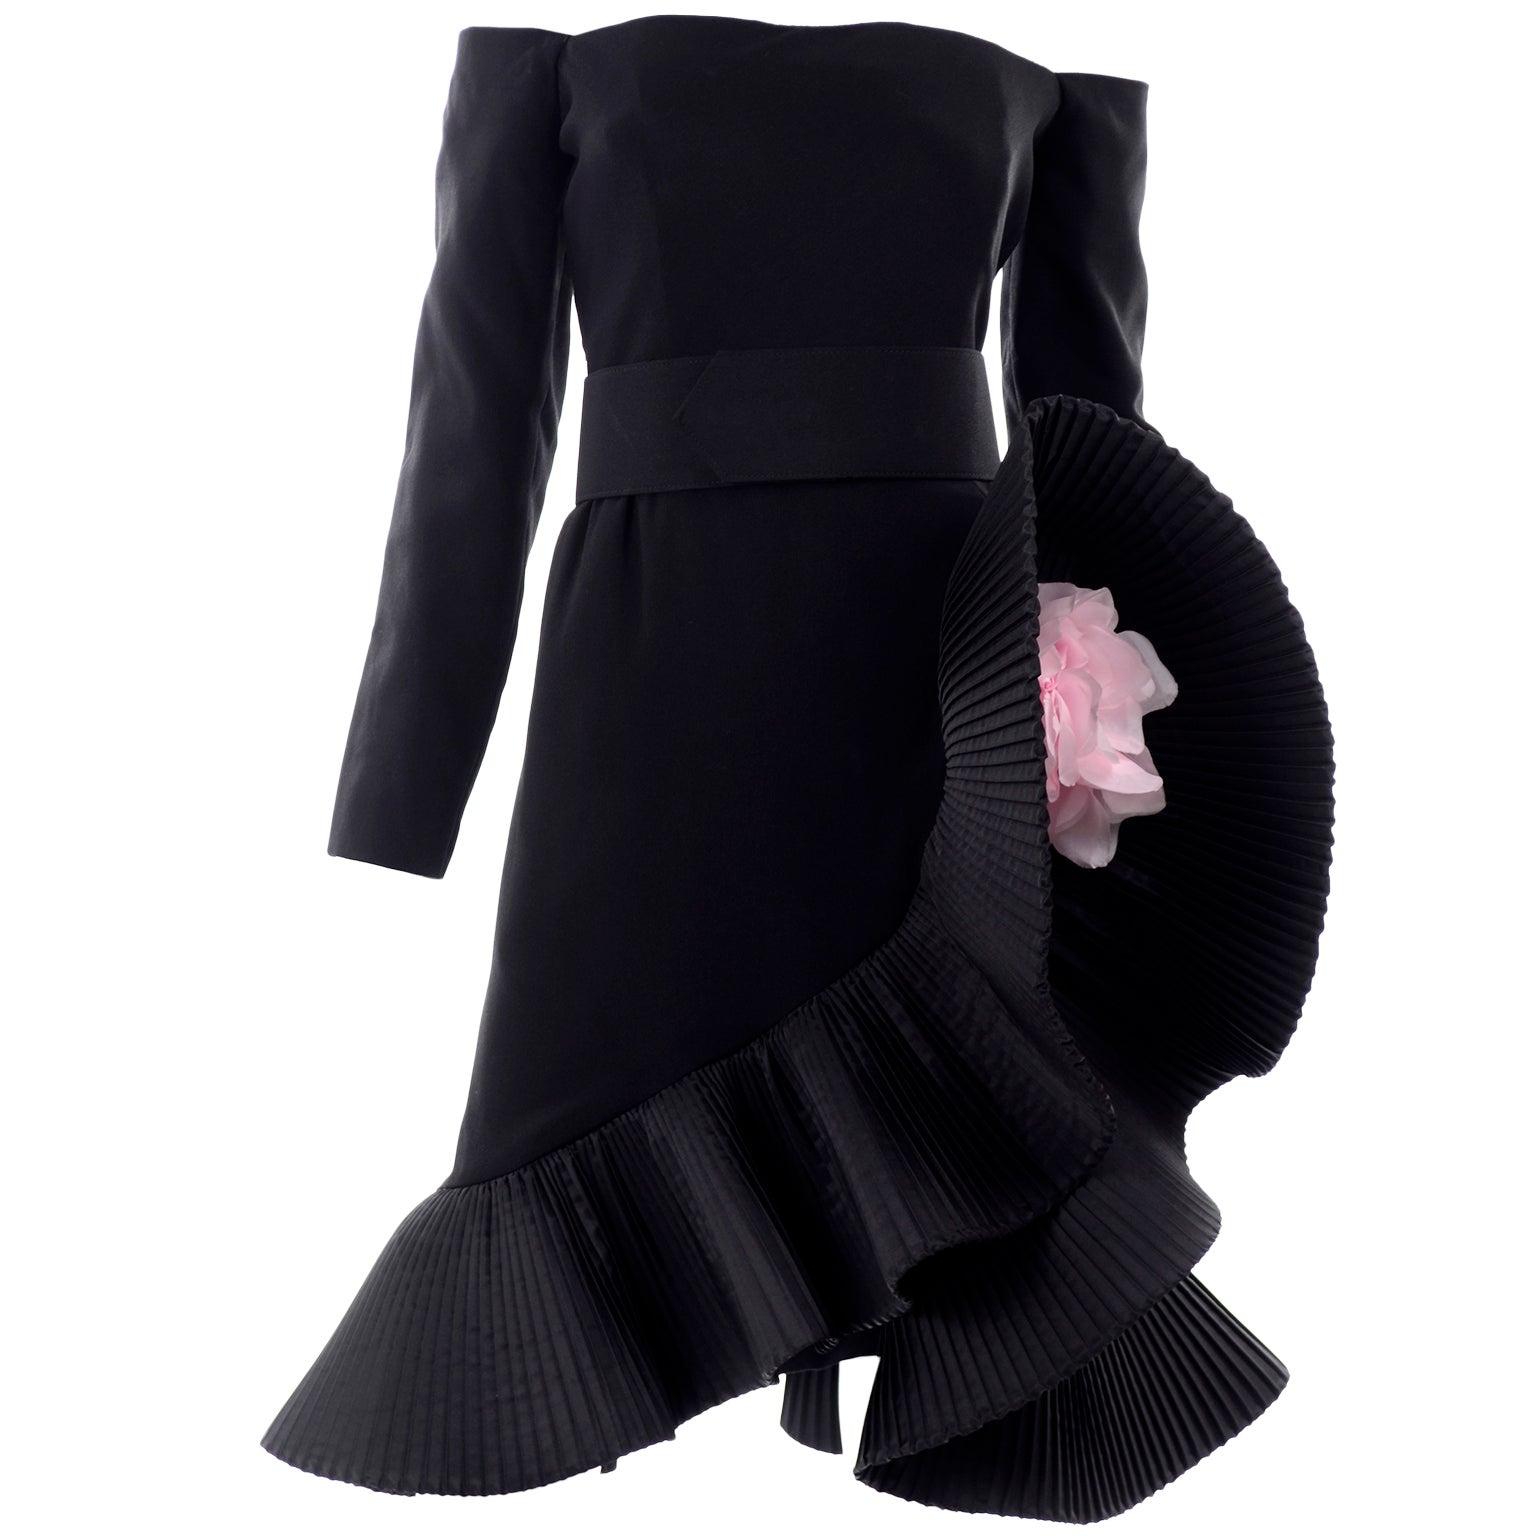 Vintage Victor Costa Black Off Shoulder Dress W Pleated Ruffle & Pink Flower